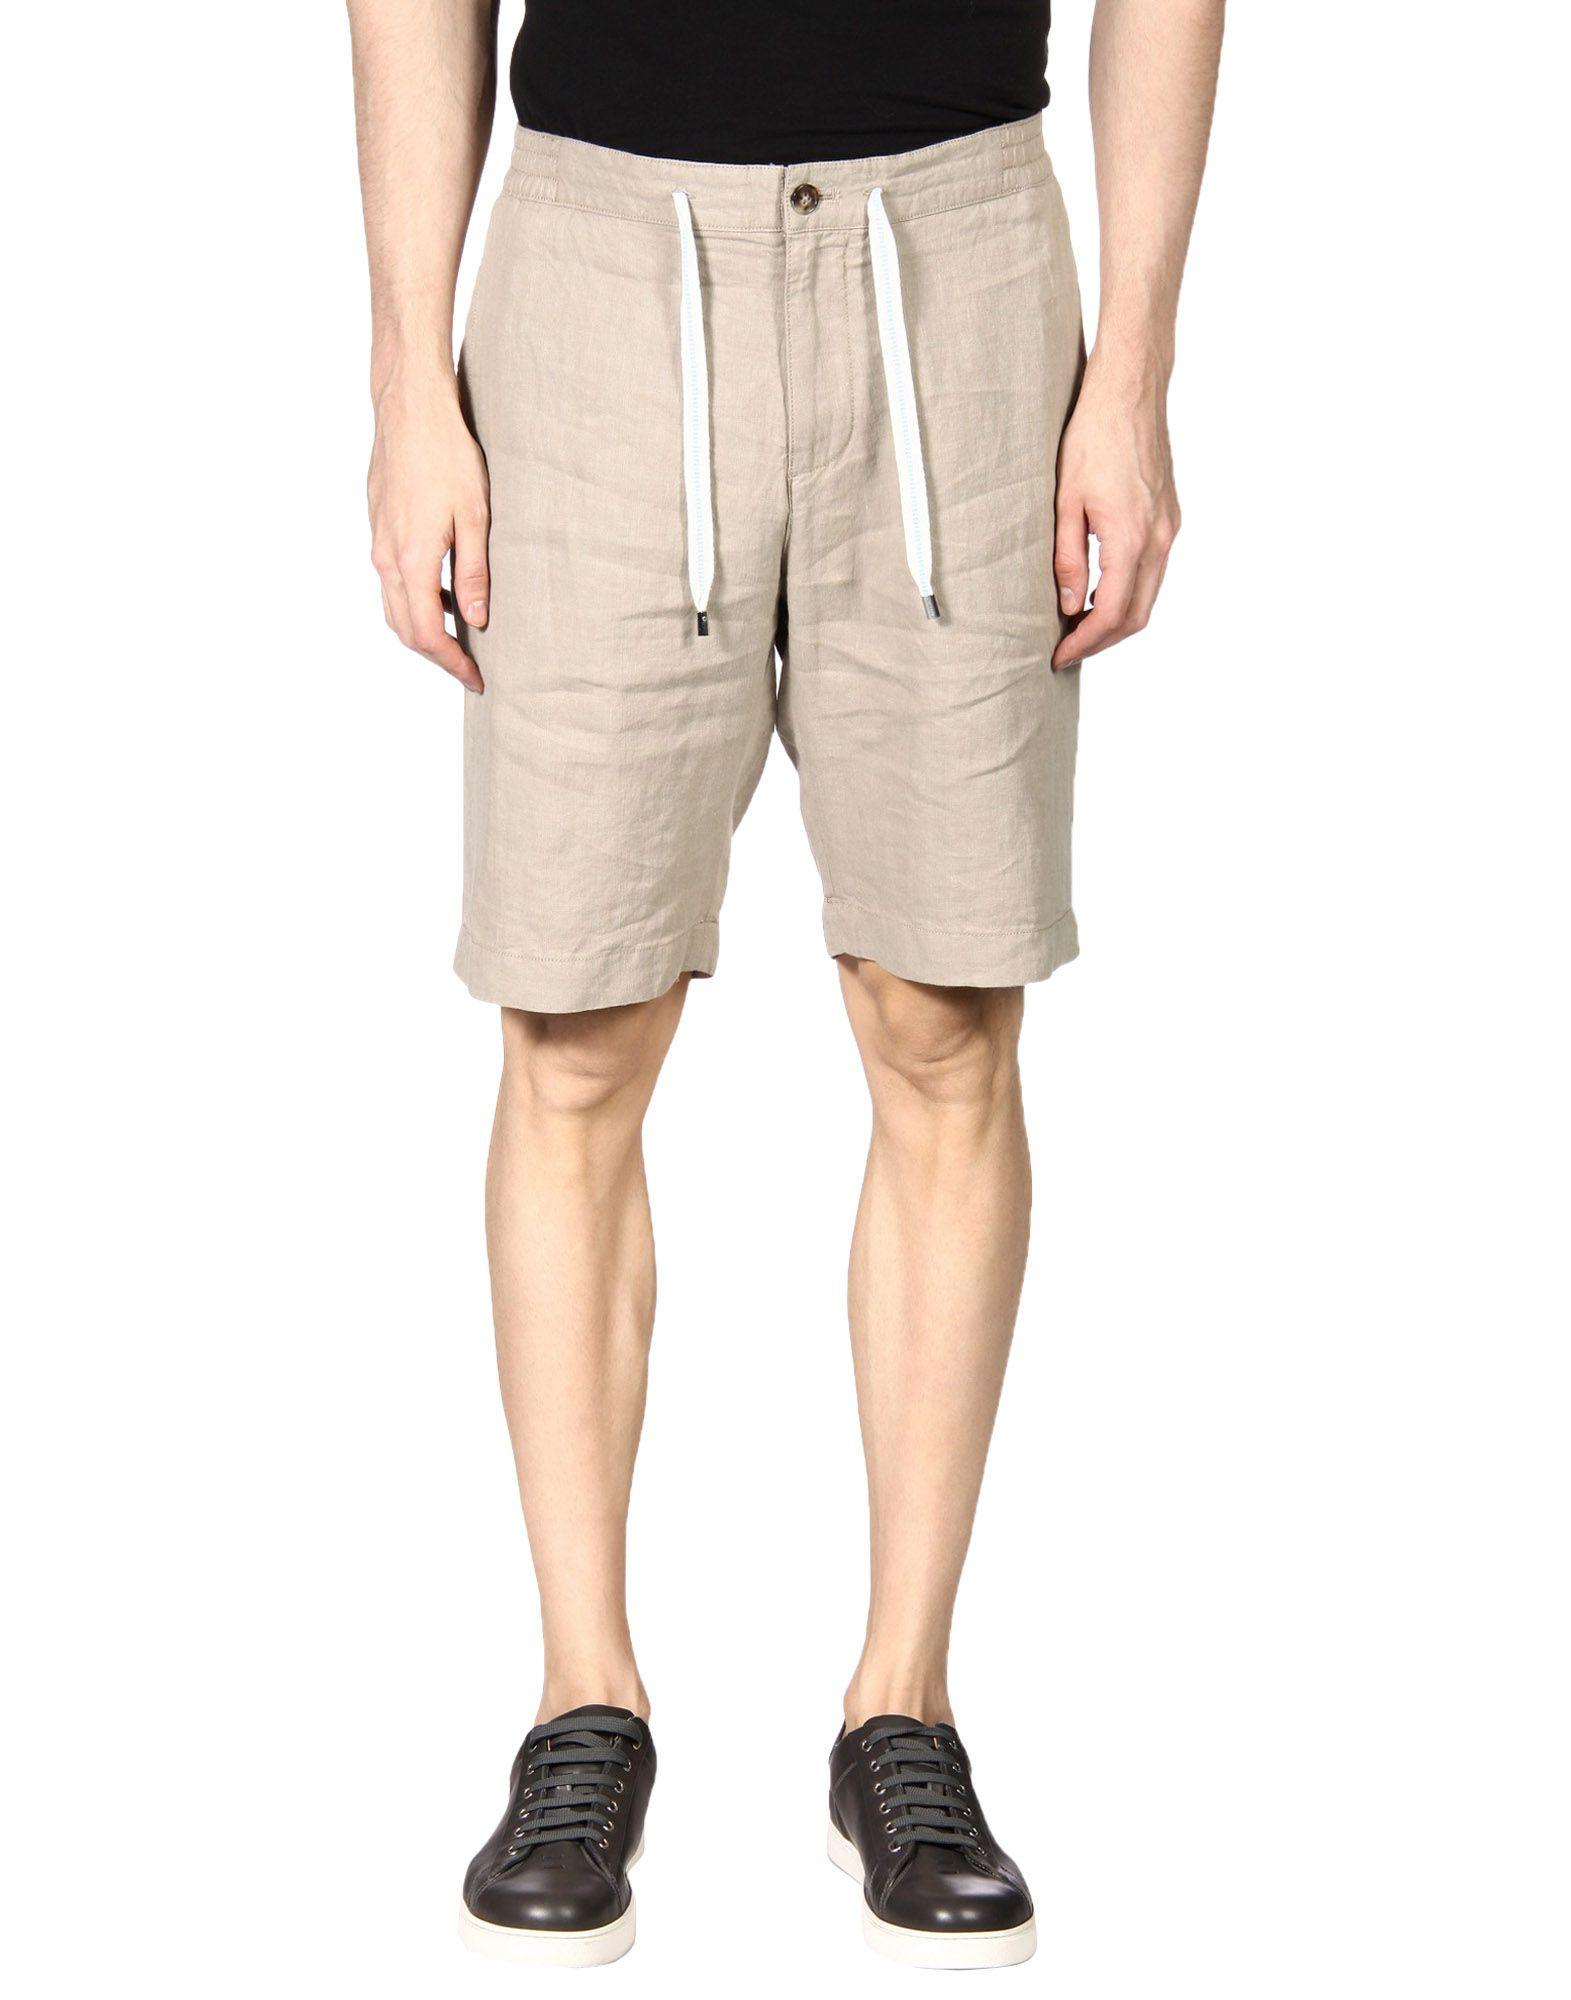 FAÇONNABLE Shorts & Bermuda in Khaki